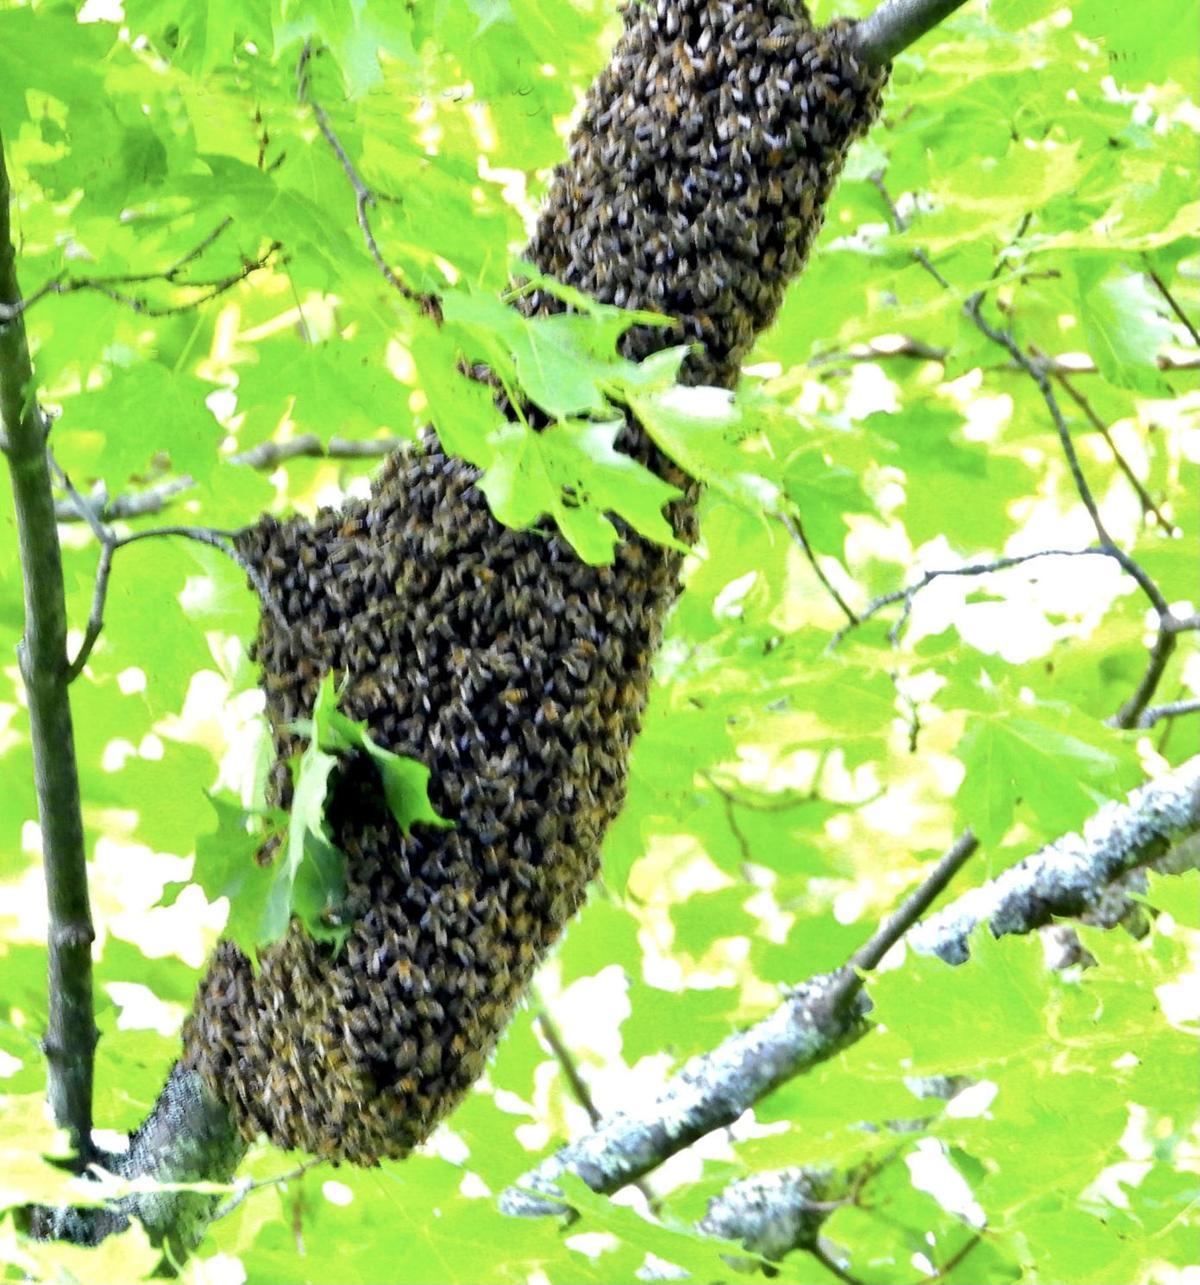 20210611-MAG-syrene swarm mid